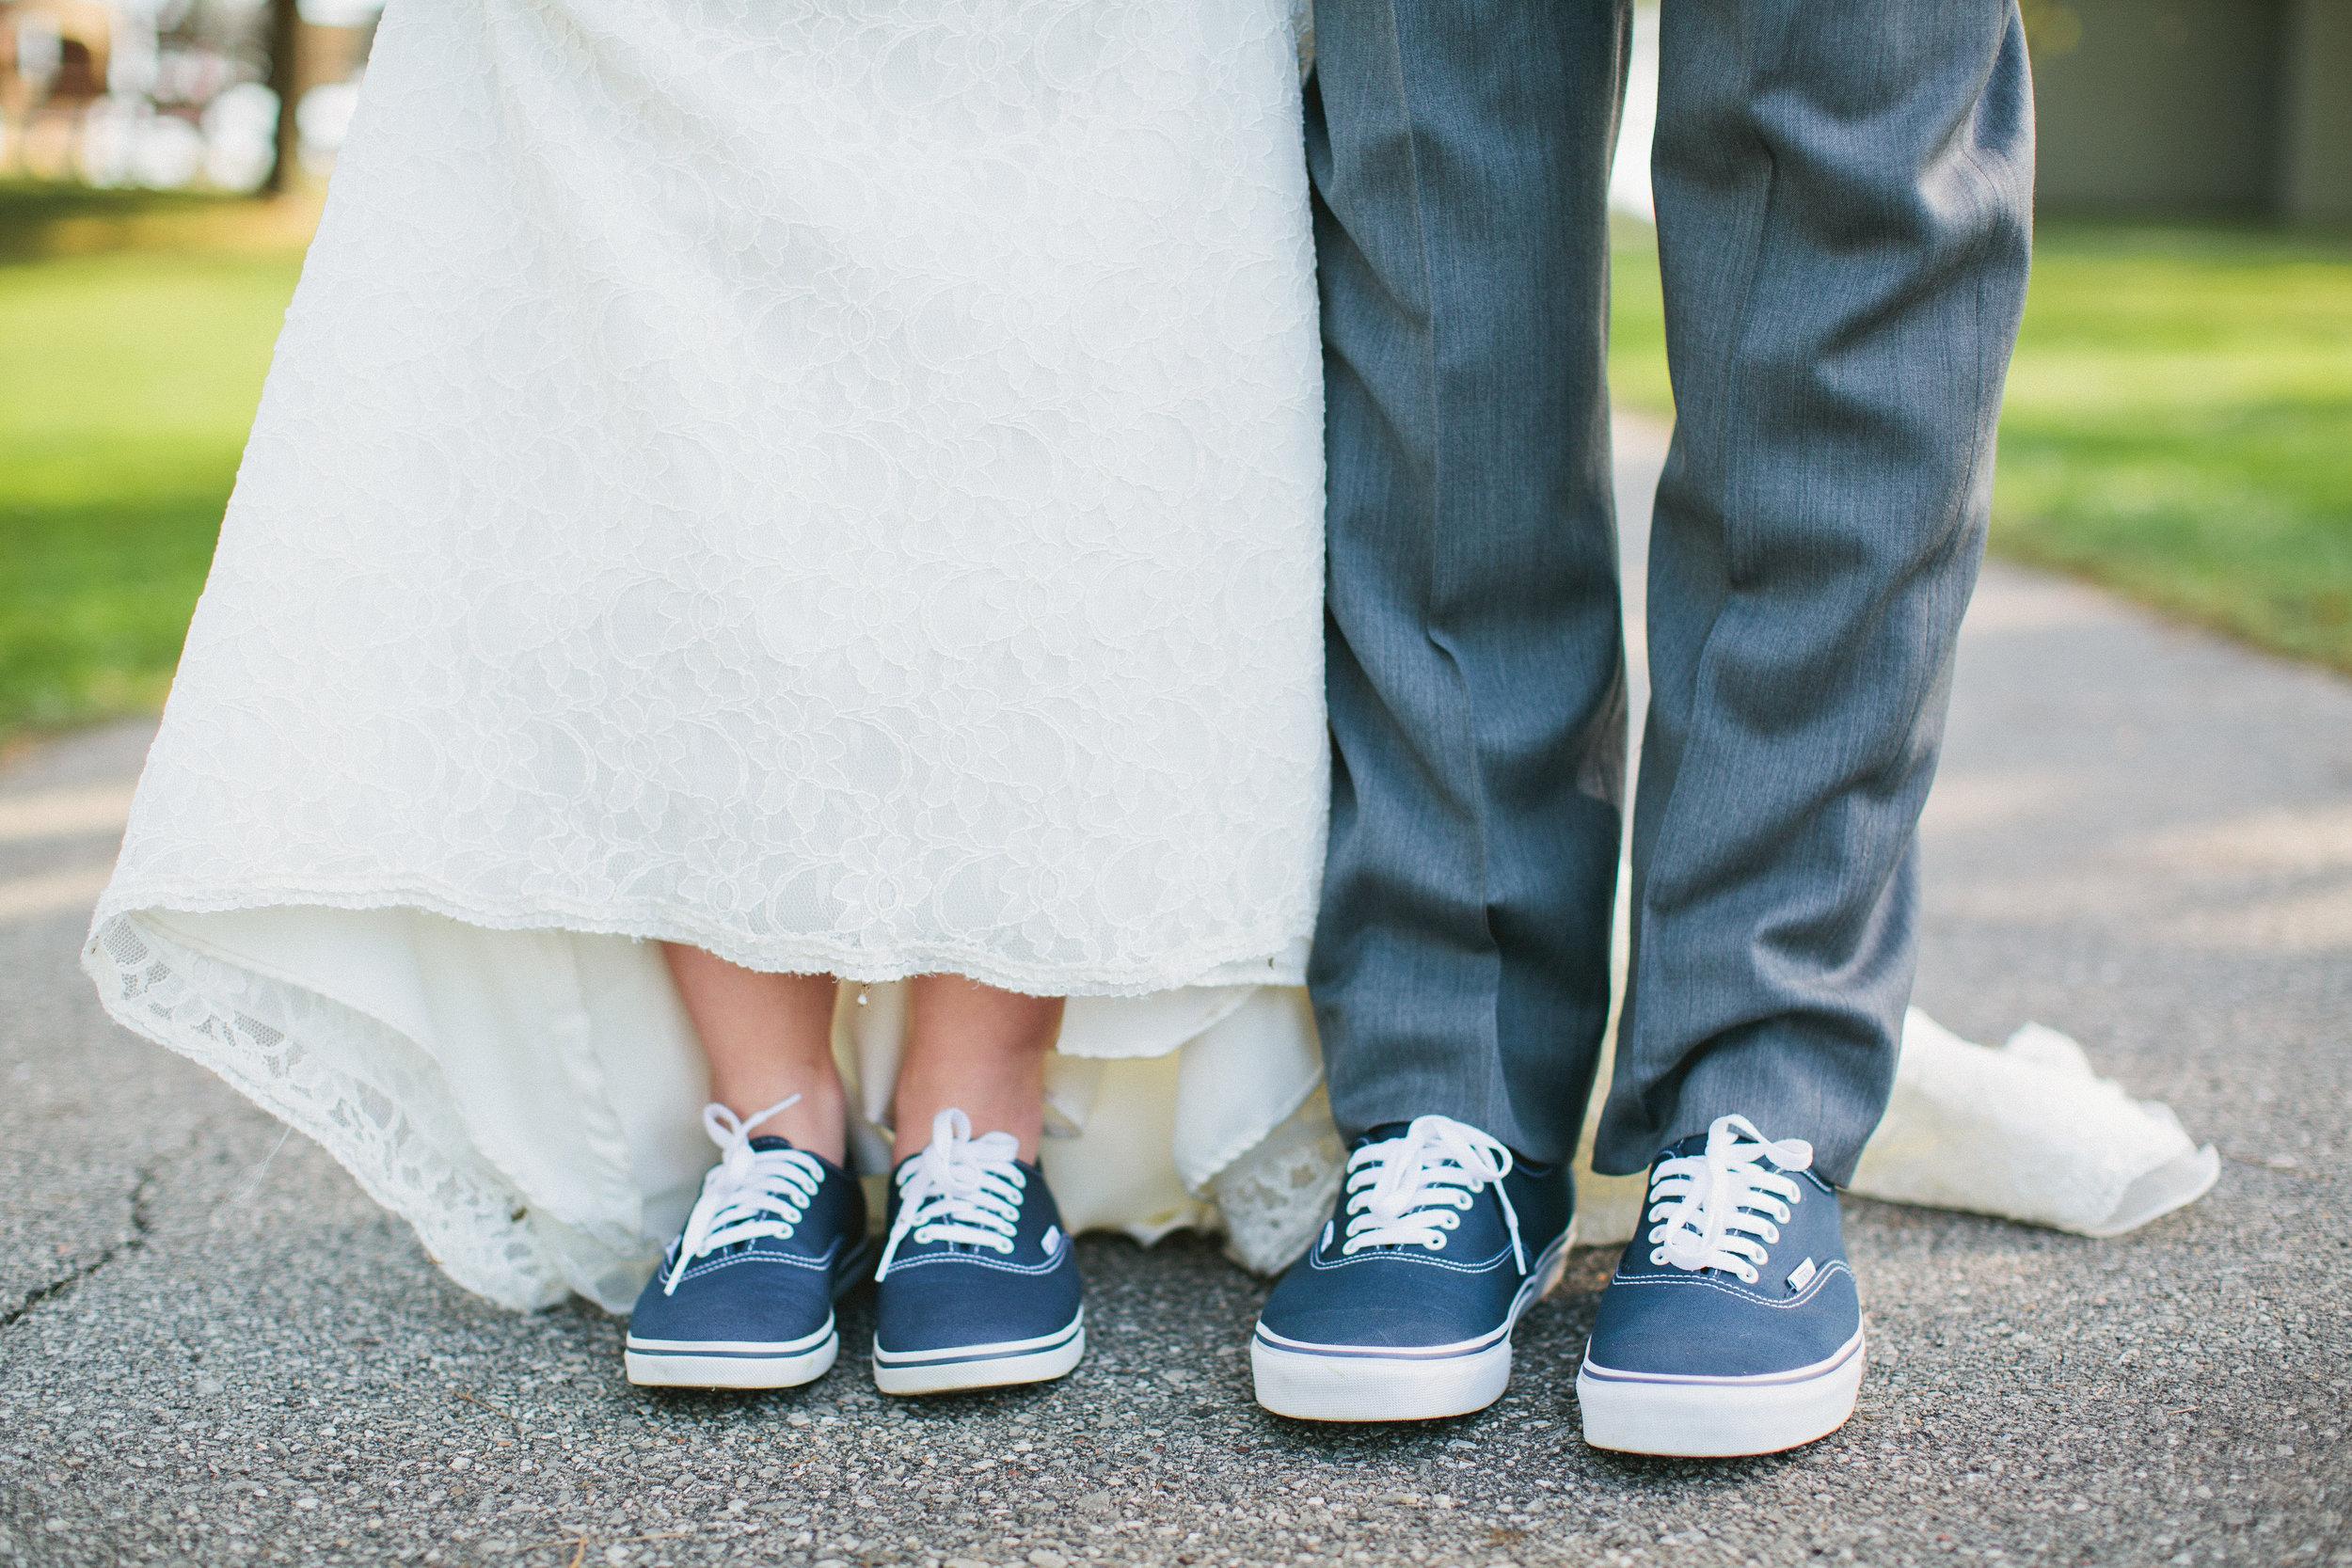 kyle_joelle_reiman_gardens_wedding_photography003